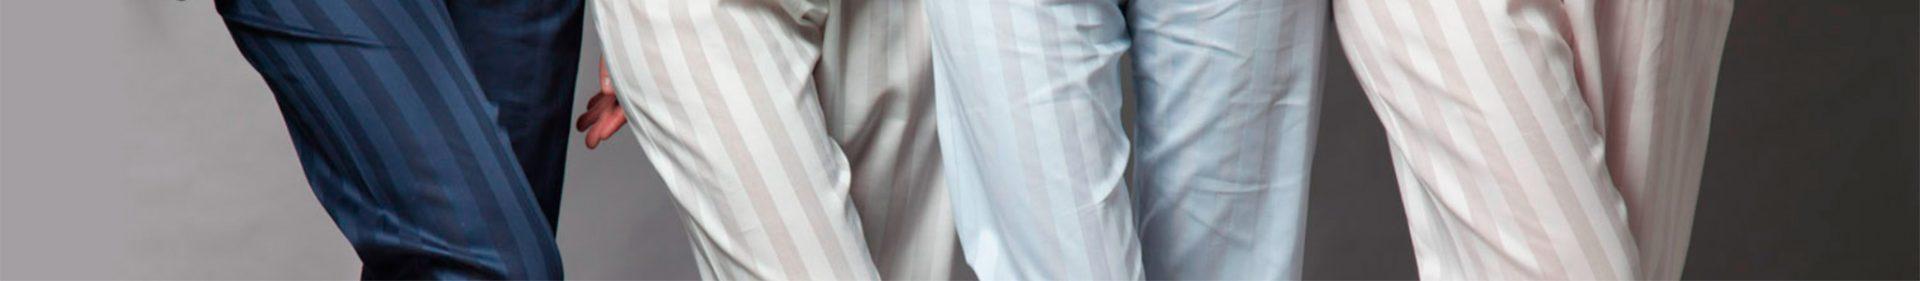 pigiami-genova